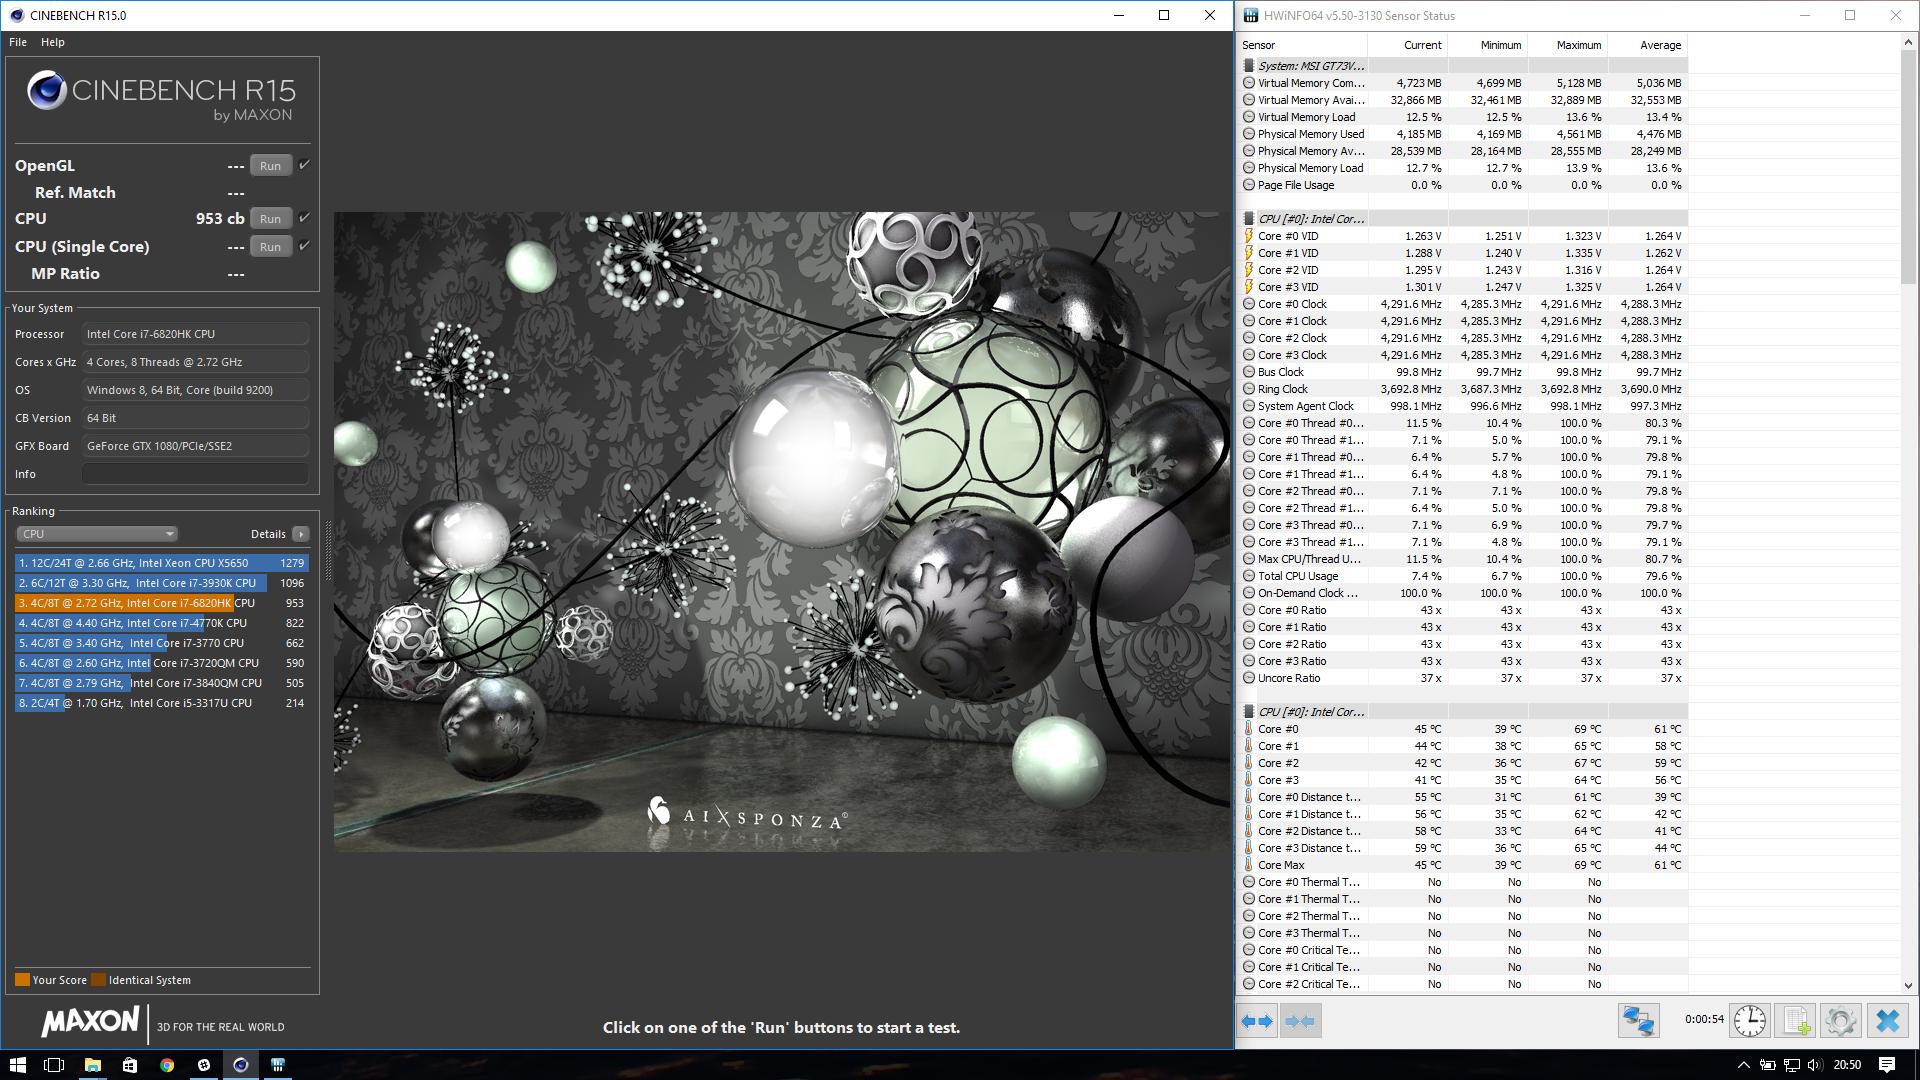 cdf942e0af0 Jizzy`s Cinebench - R15 score  953 cb with a Core i7 6820HK